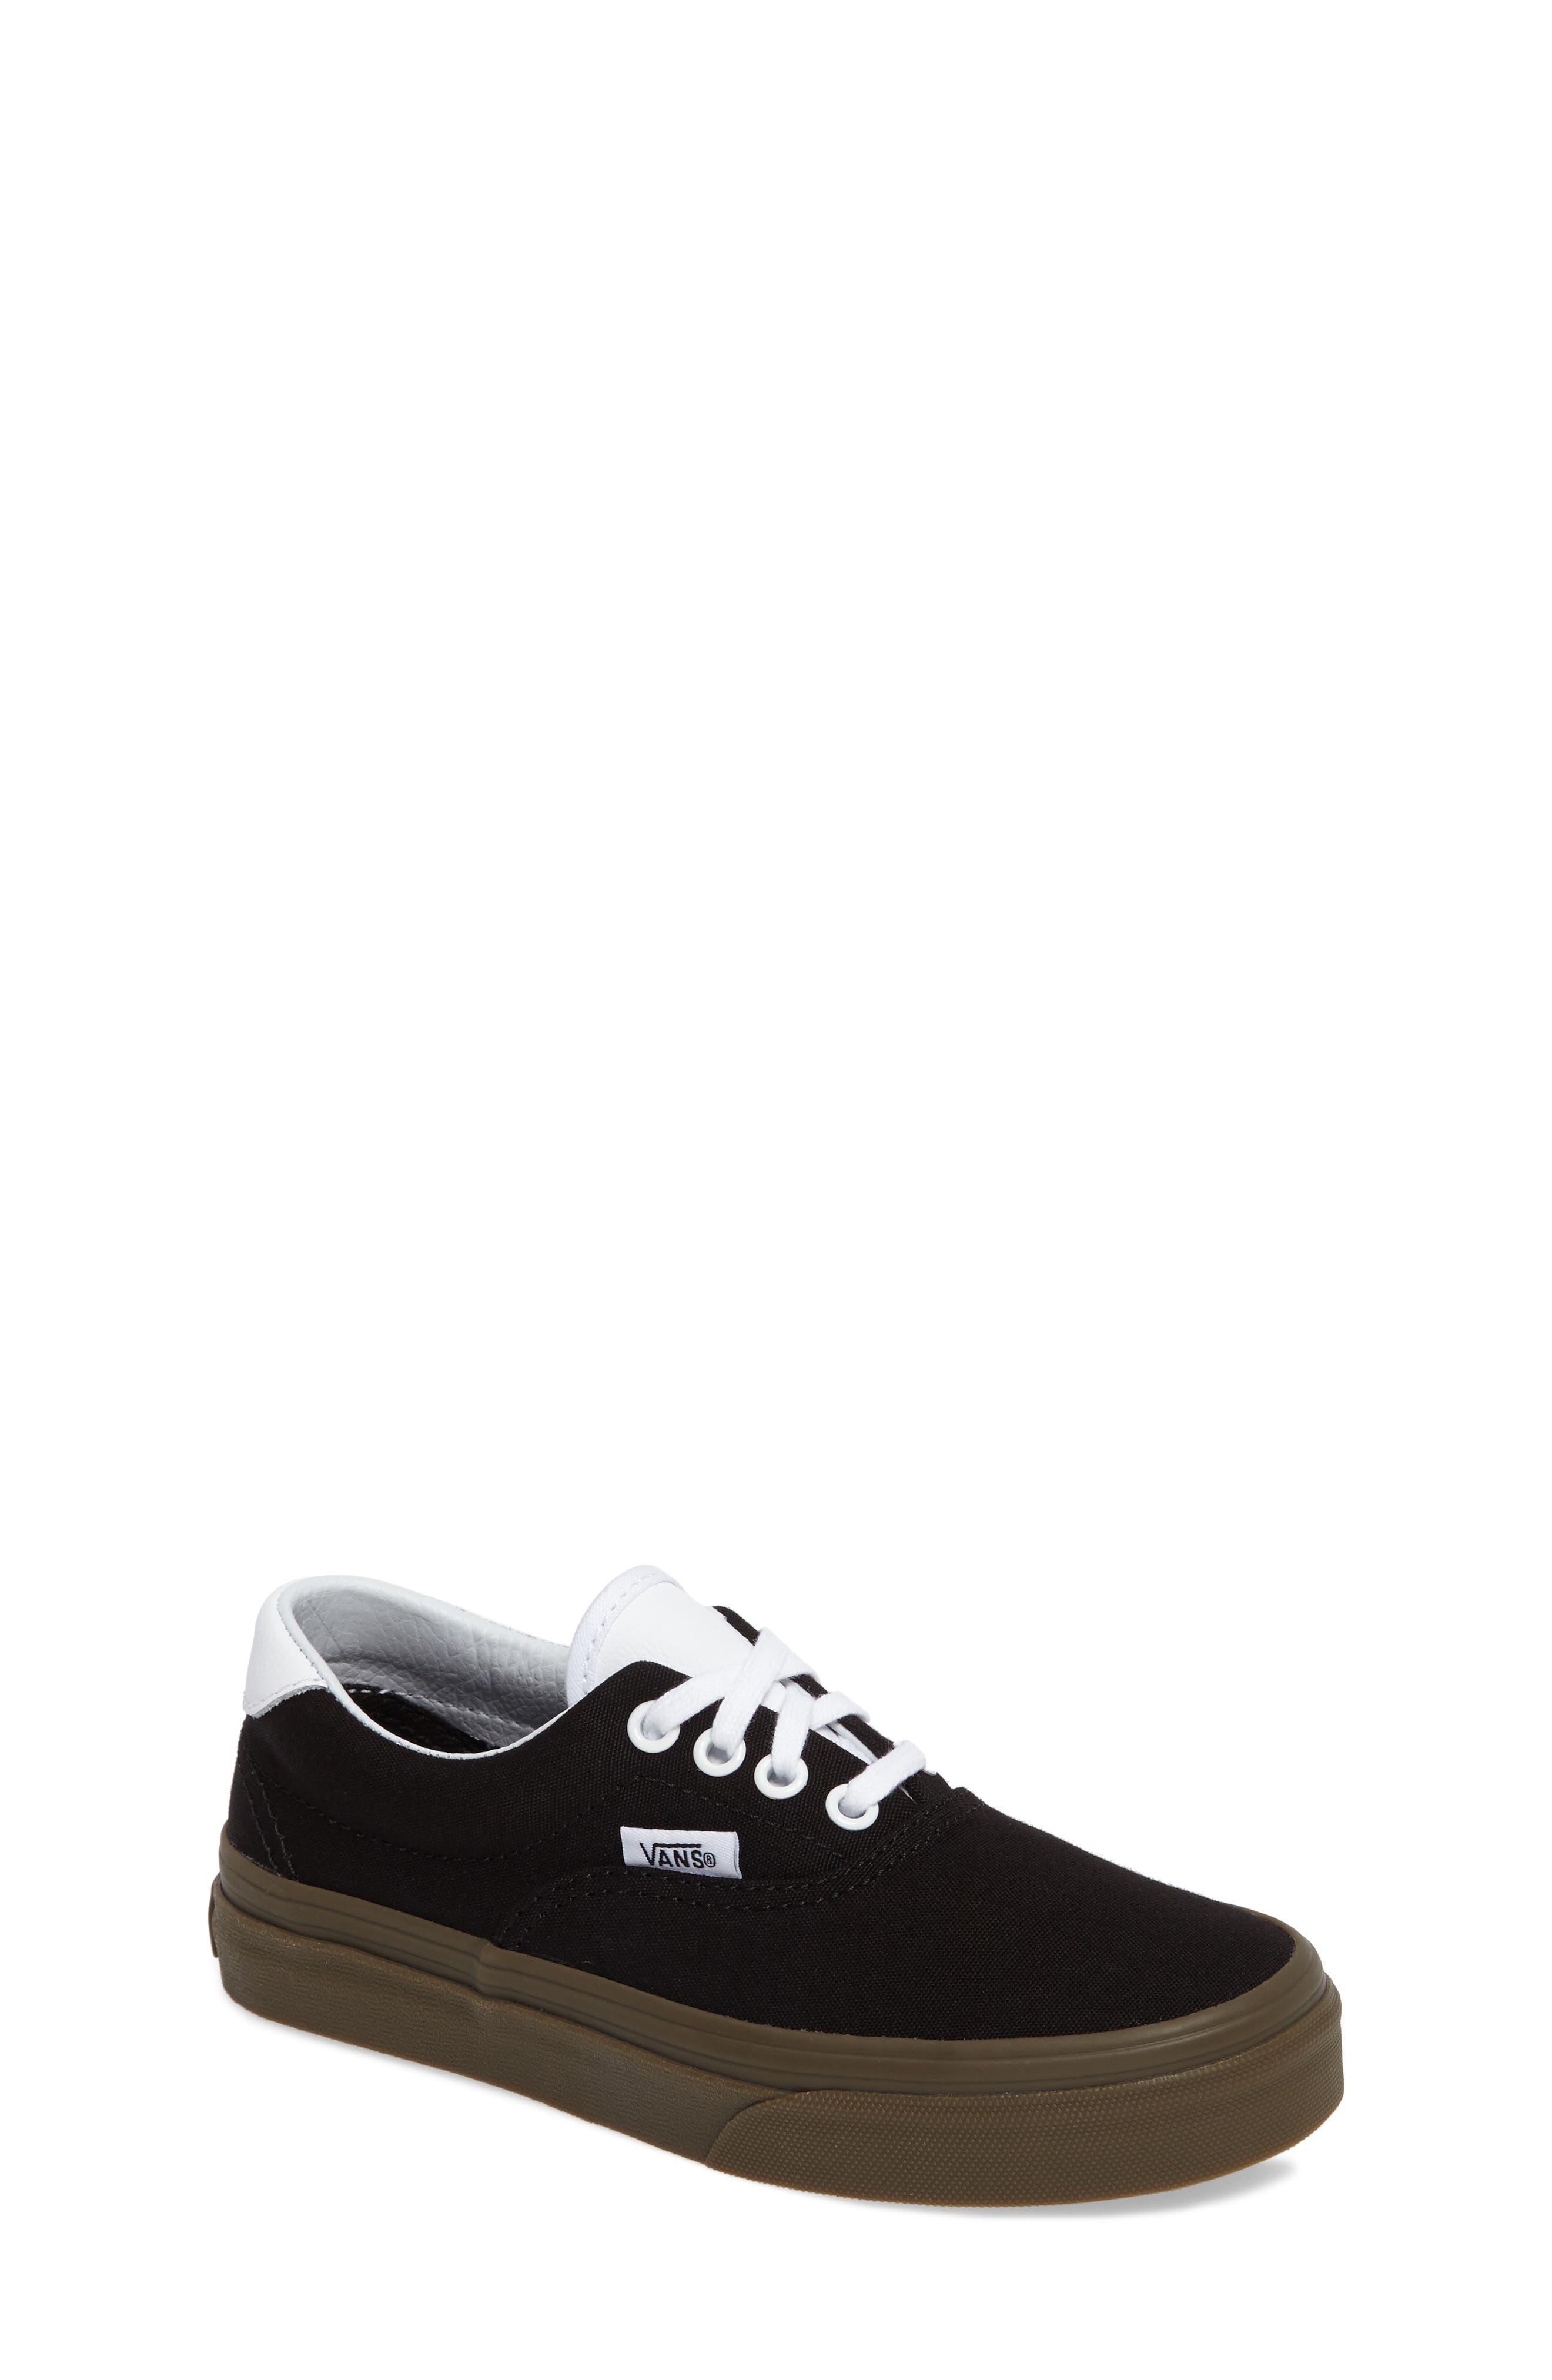 Main Image - Vans Era 59 Bleacher Sneaker (Toddler, Little Kid & Big Kid)